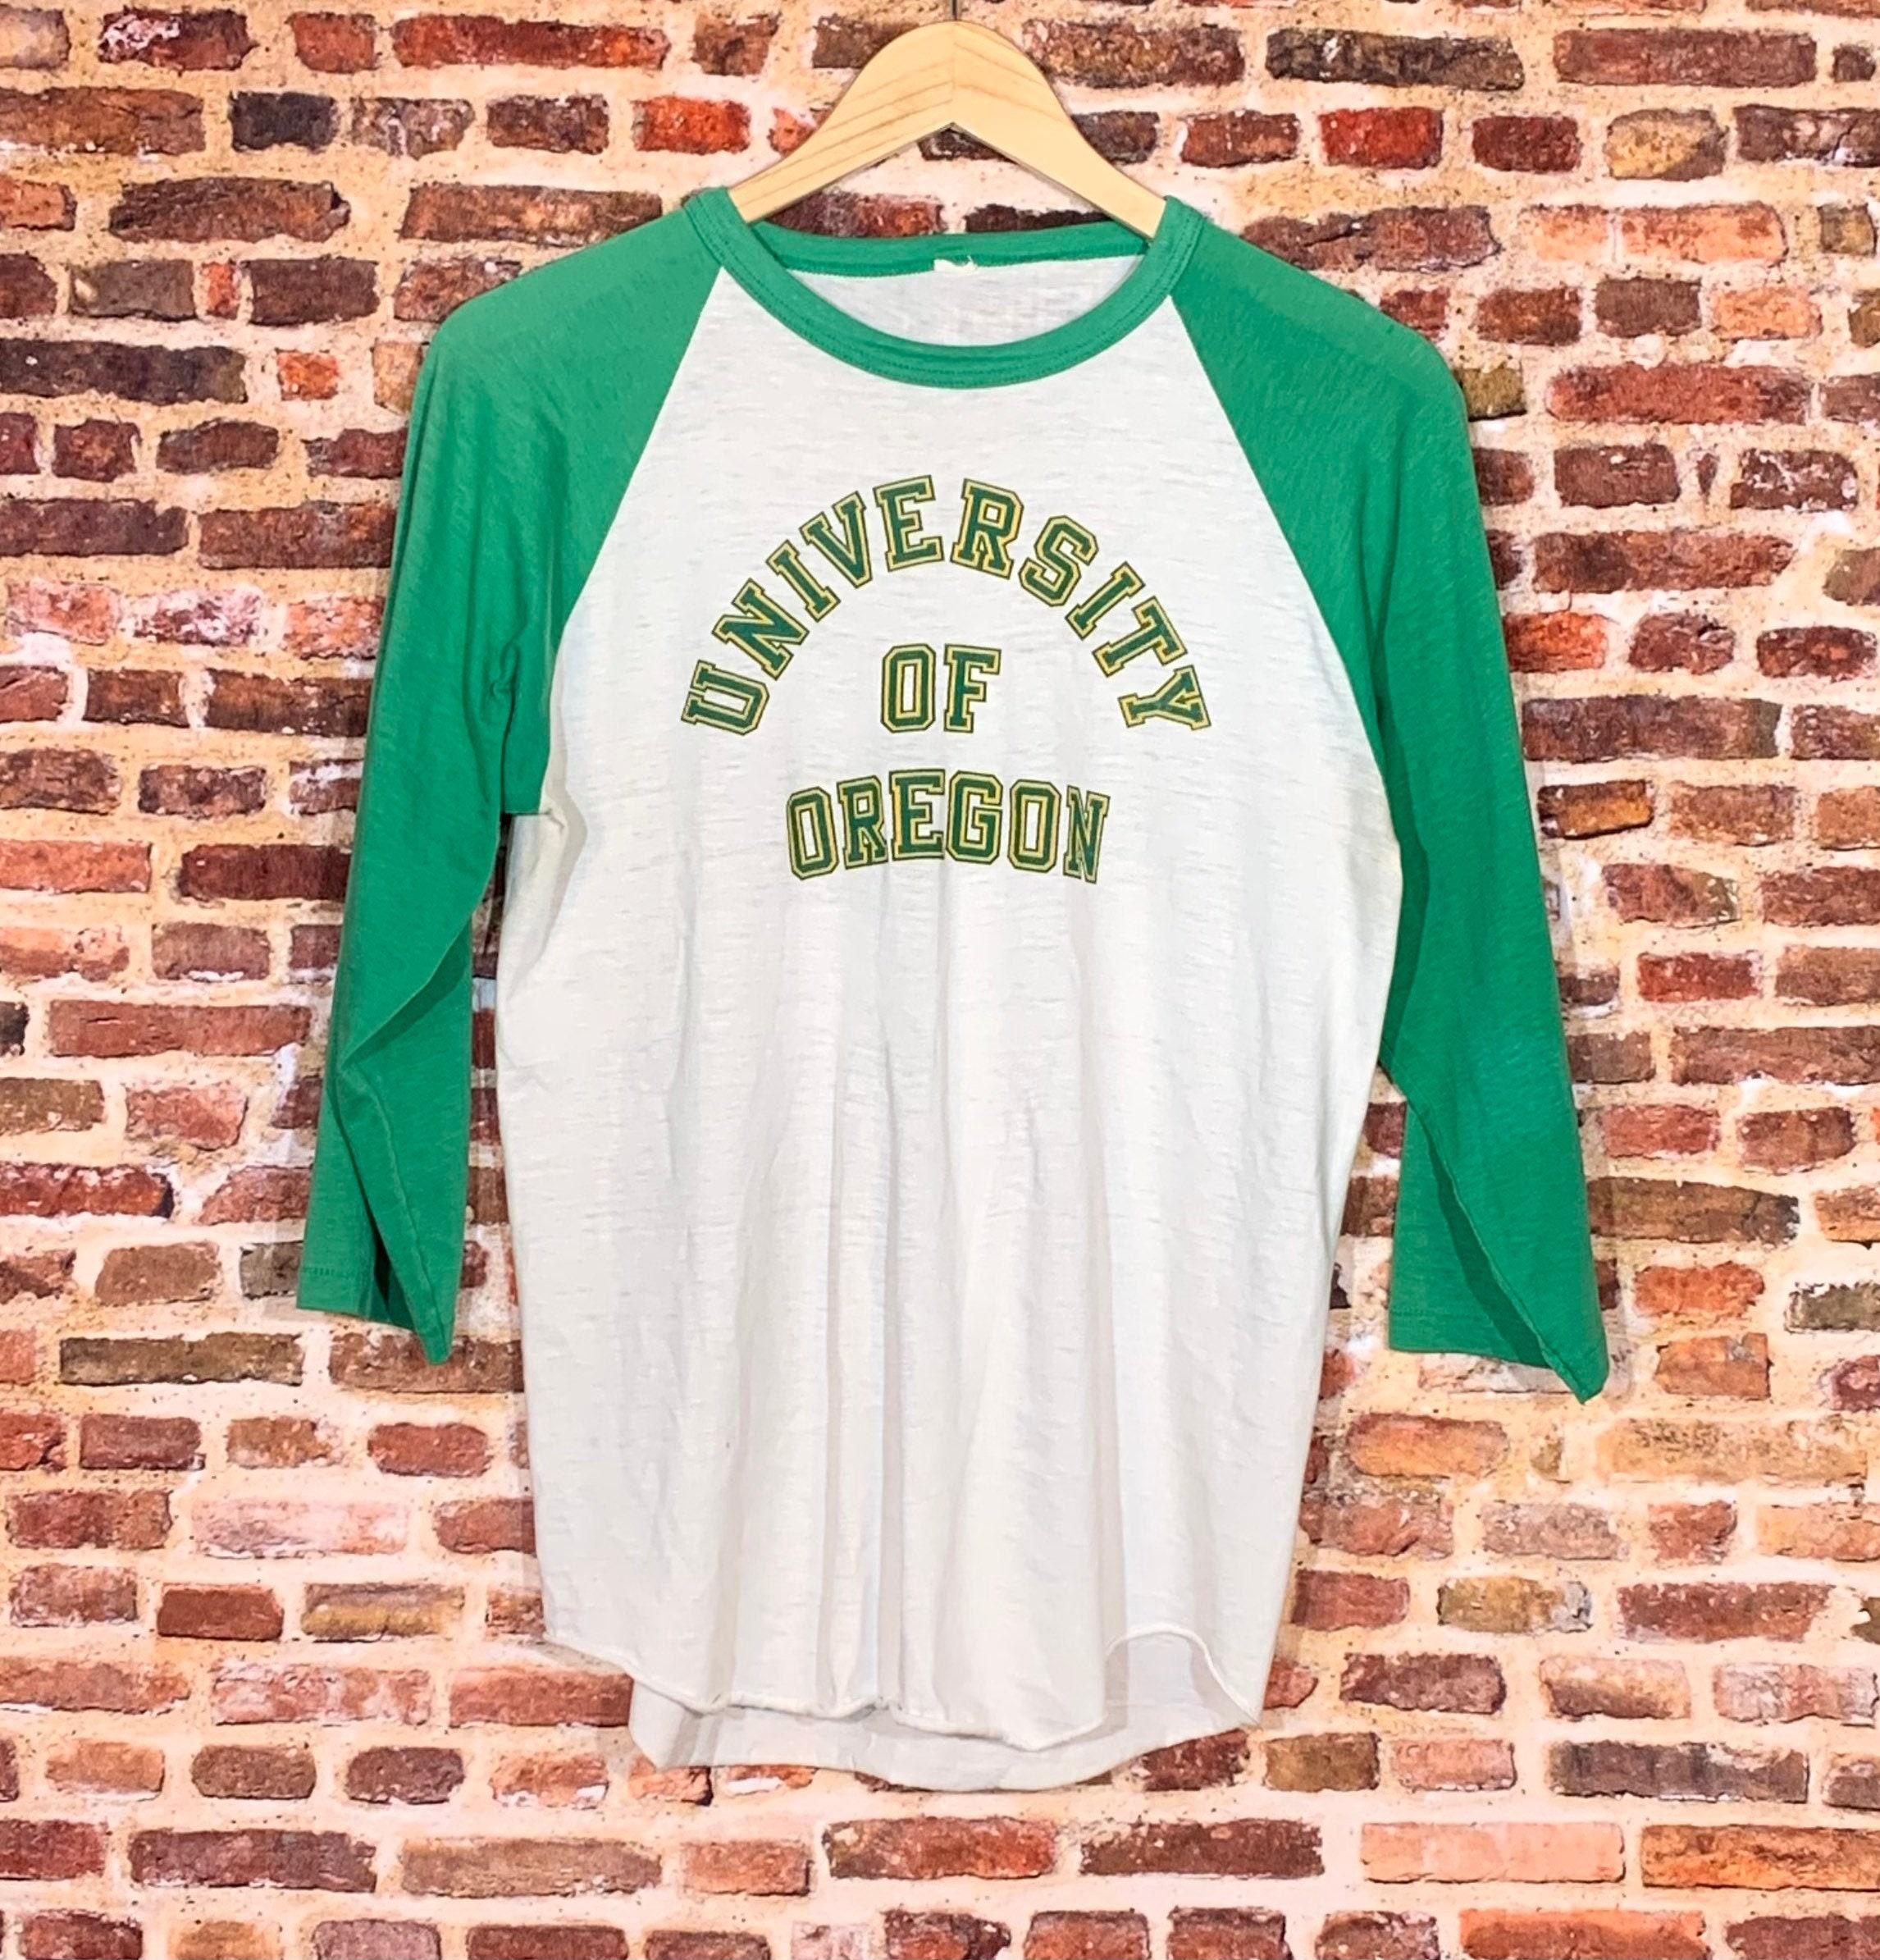 1970s Mens Shirt Styles – Vintage 70s Shirts for Guys Vintage 70s Oregon Ducks Mens Medium Tee Shirt Rare $17.00 AT vintagedancer.com